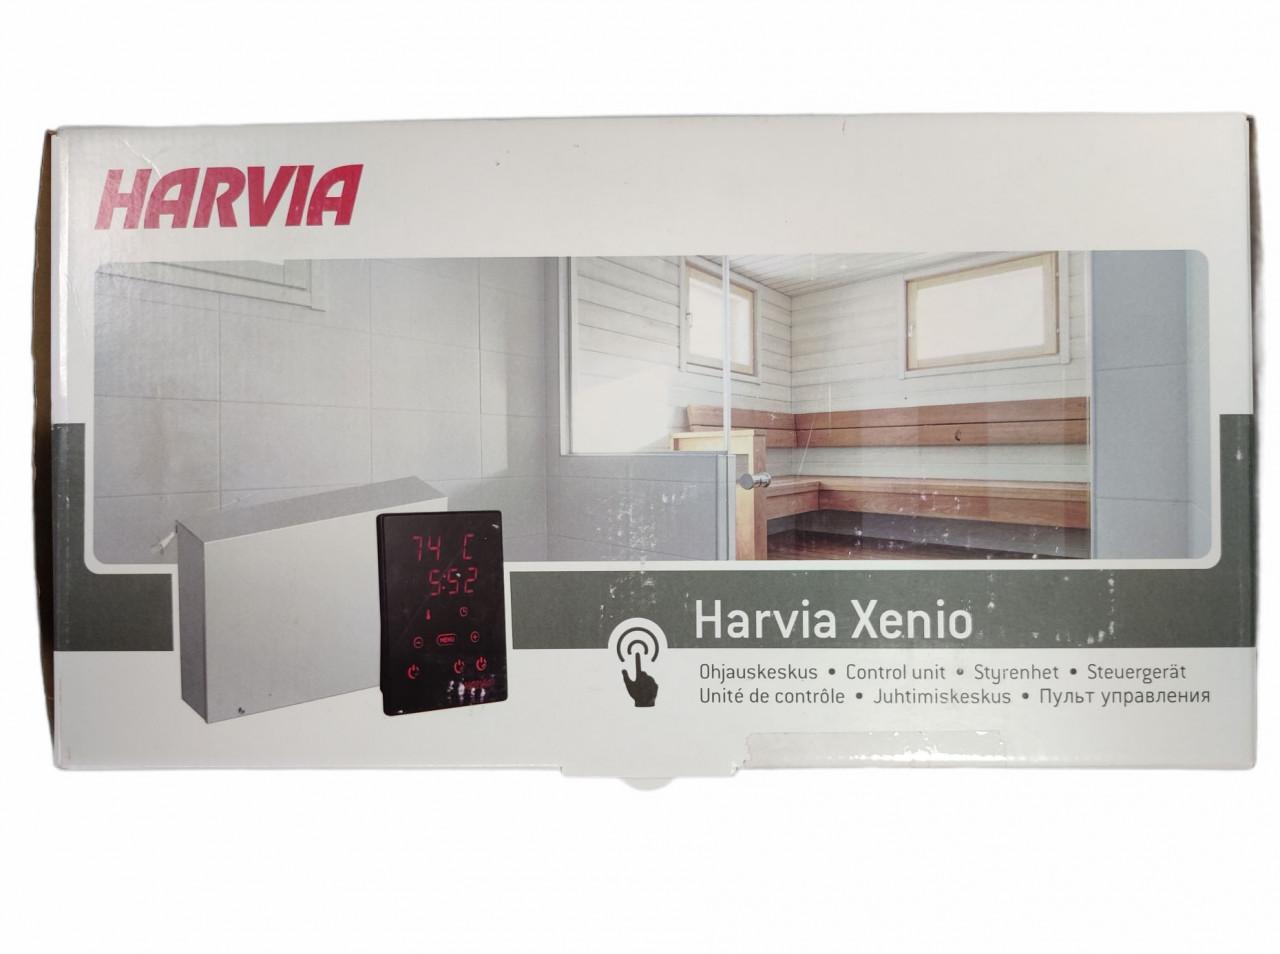 Harvia Xenio saunabesturing 17.0 kW (refurbished)